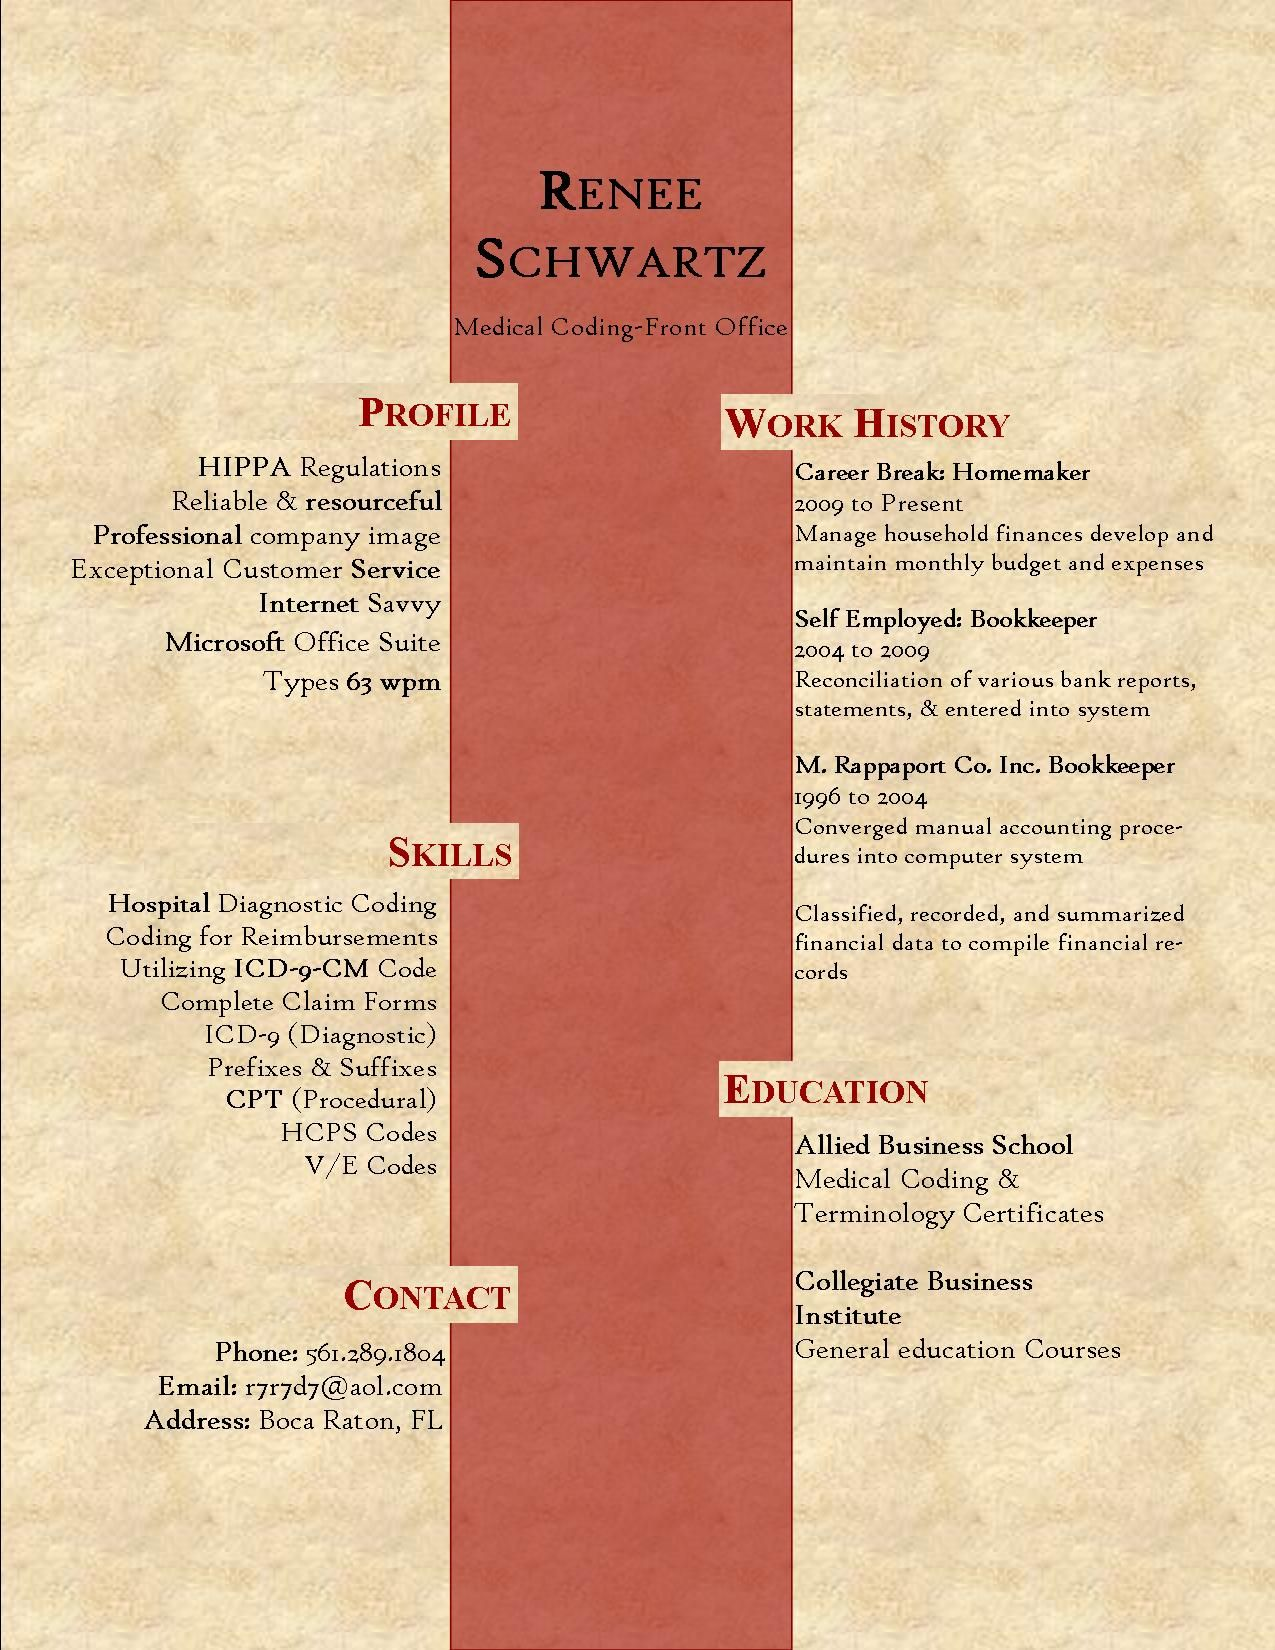 Medical coding student renee schwartz resume career